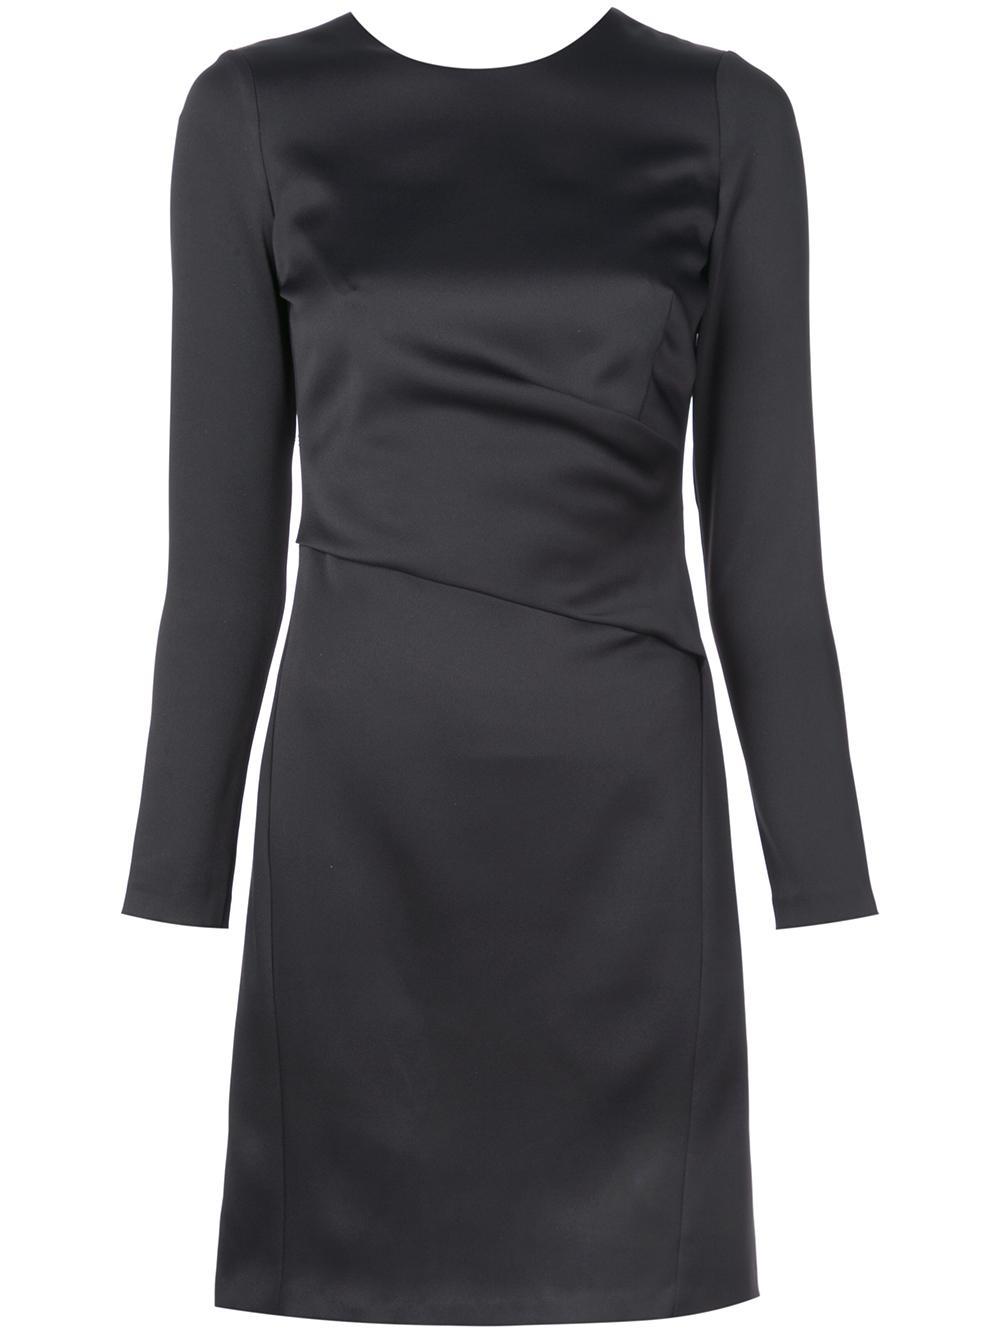 Stretch Crepe Long Slv Shift Dress Item # LW143